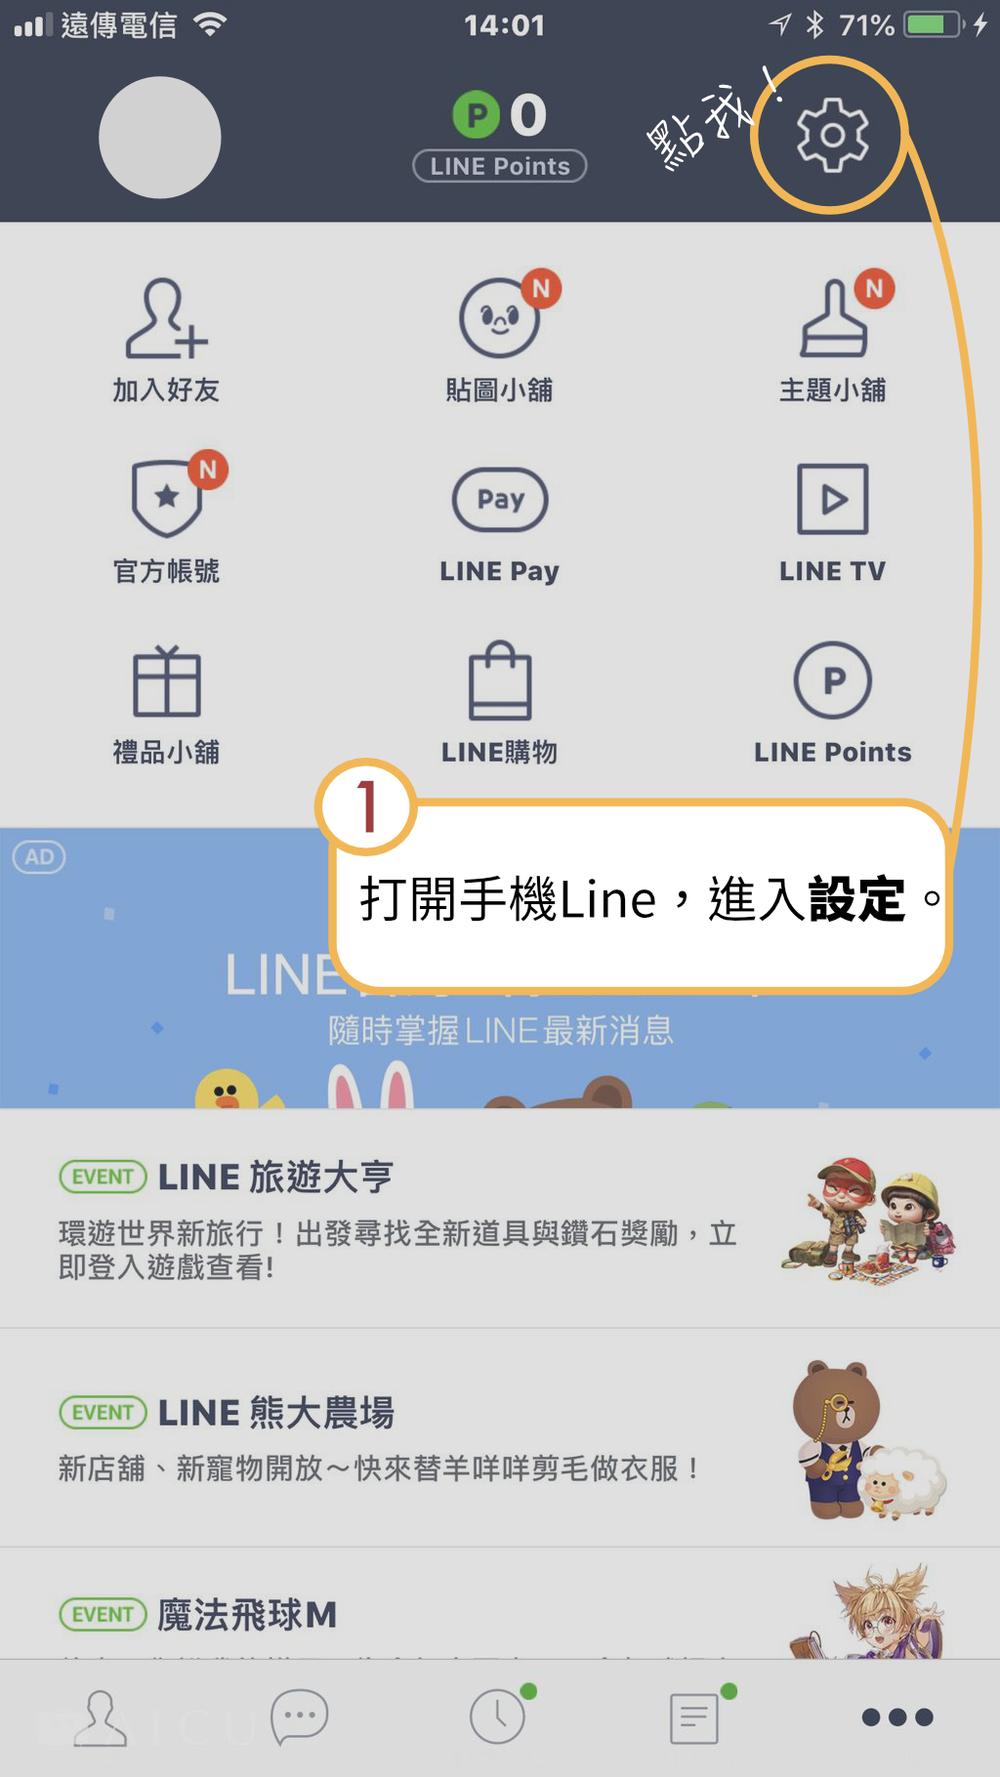 line0001.png